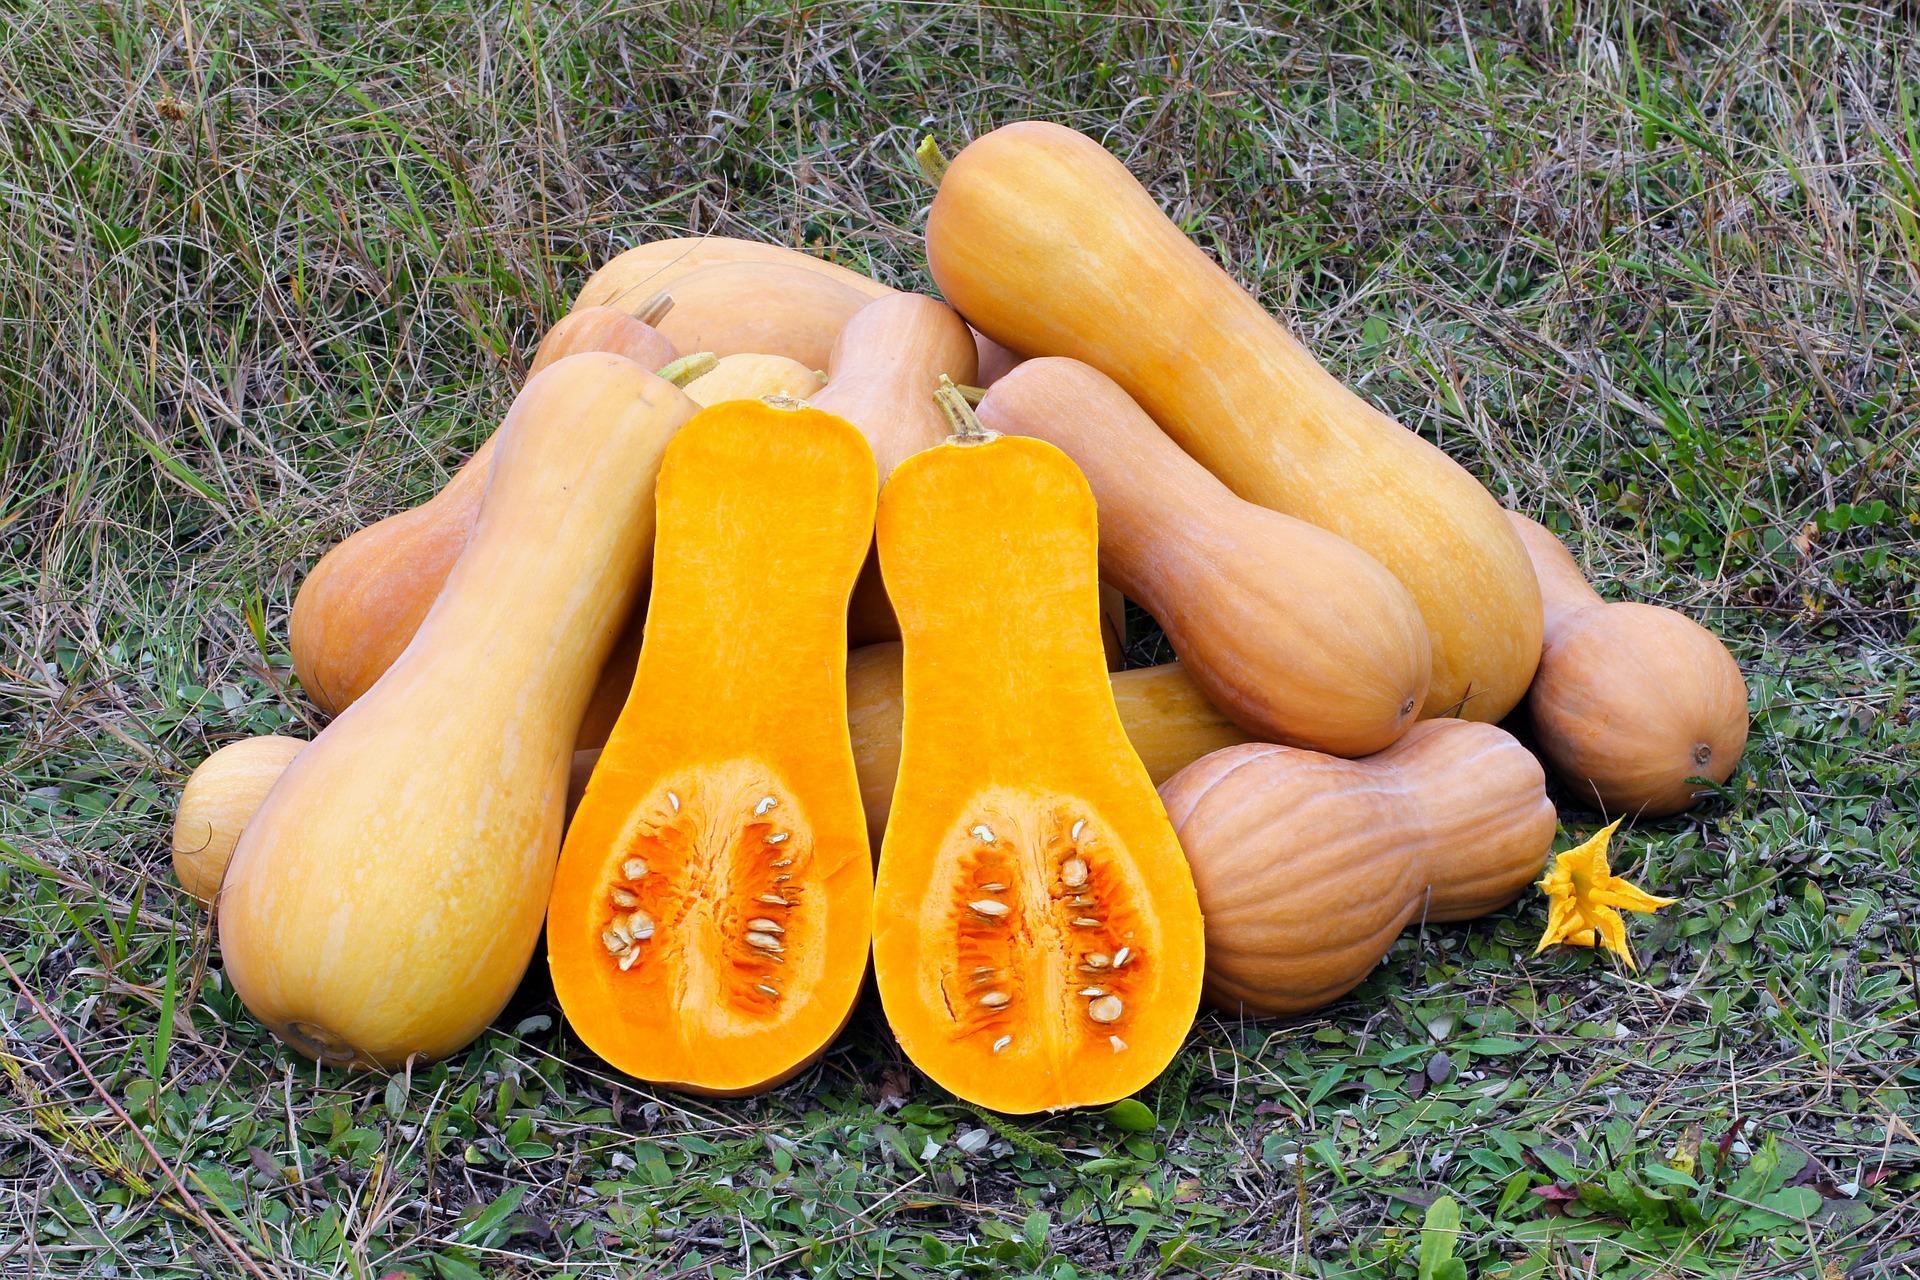 https://pixabay.com/en/butternut-squash-produce-gourd-109131/